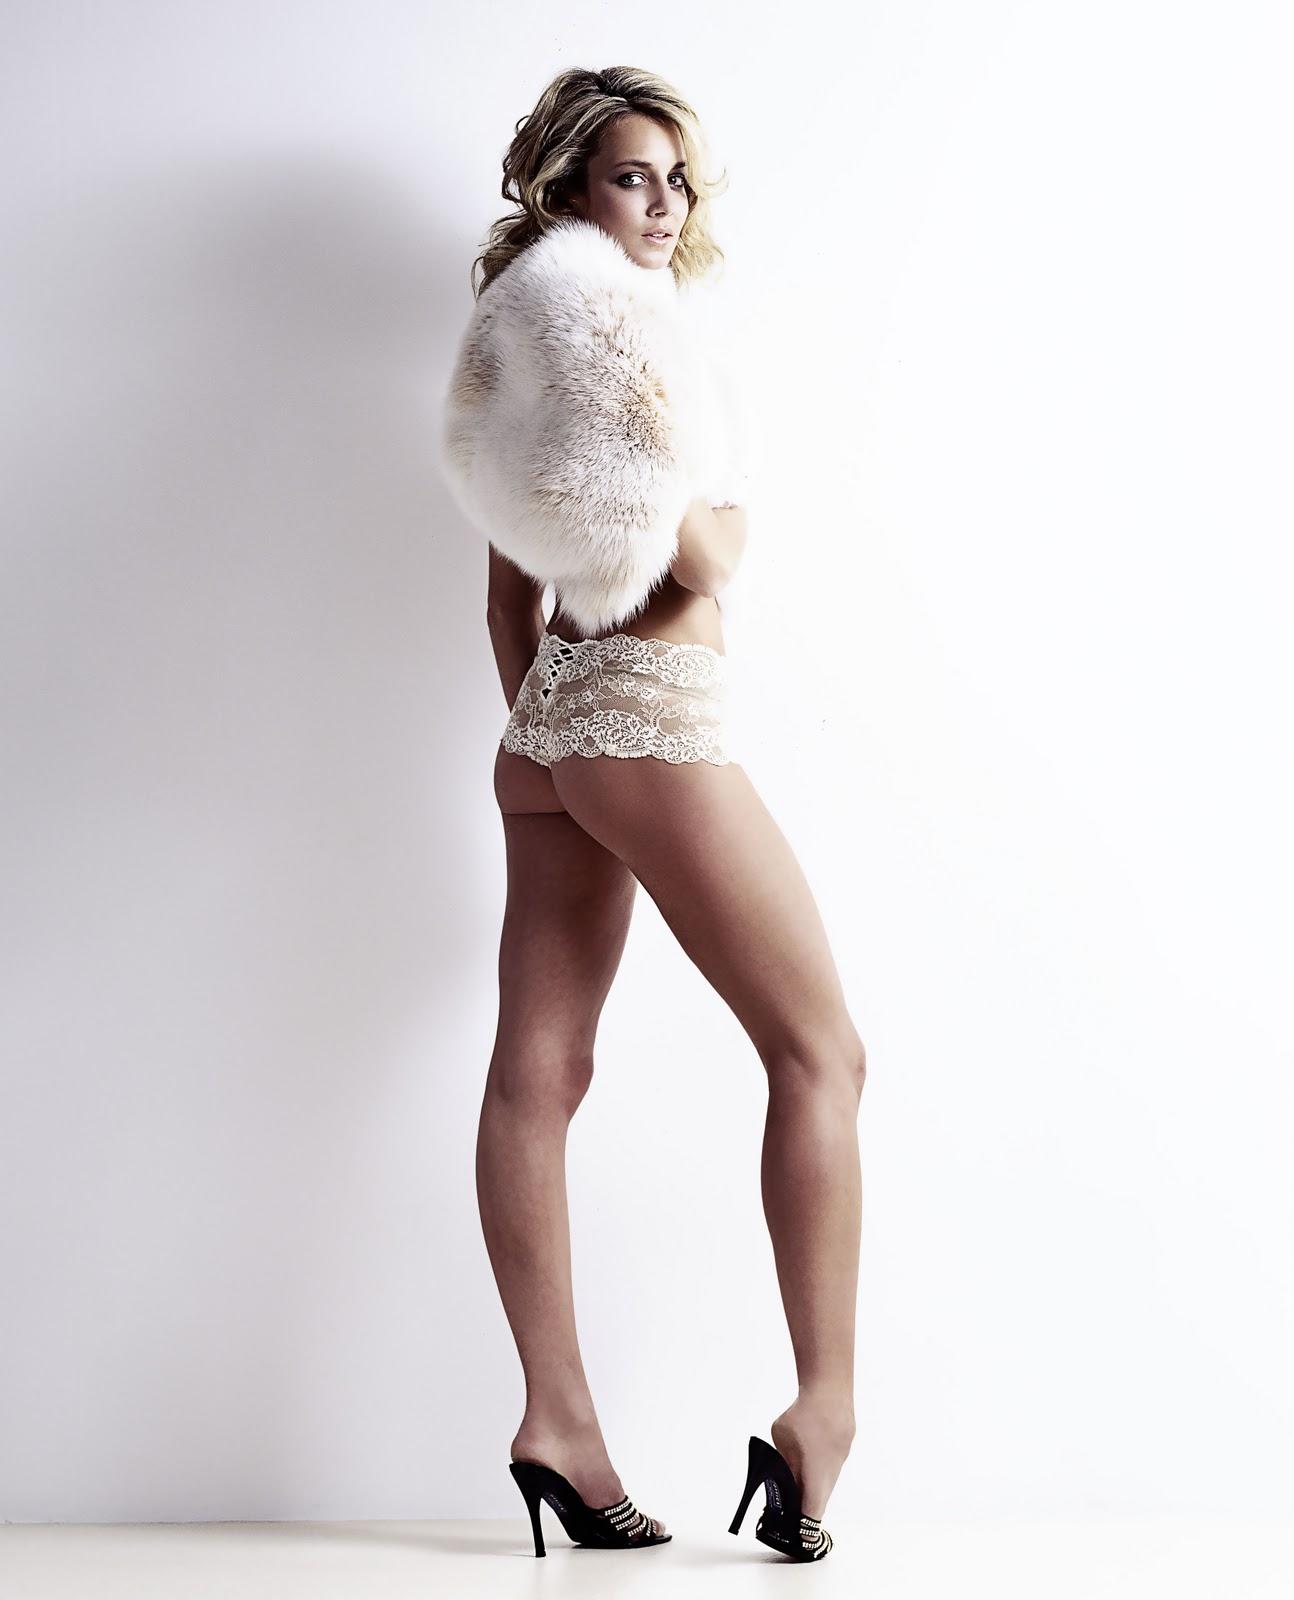 Lady Victoria Hervey Topless 3